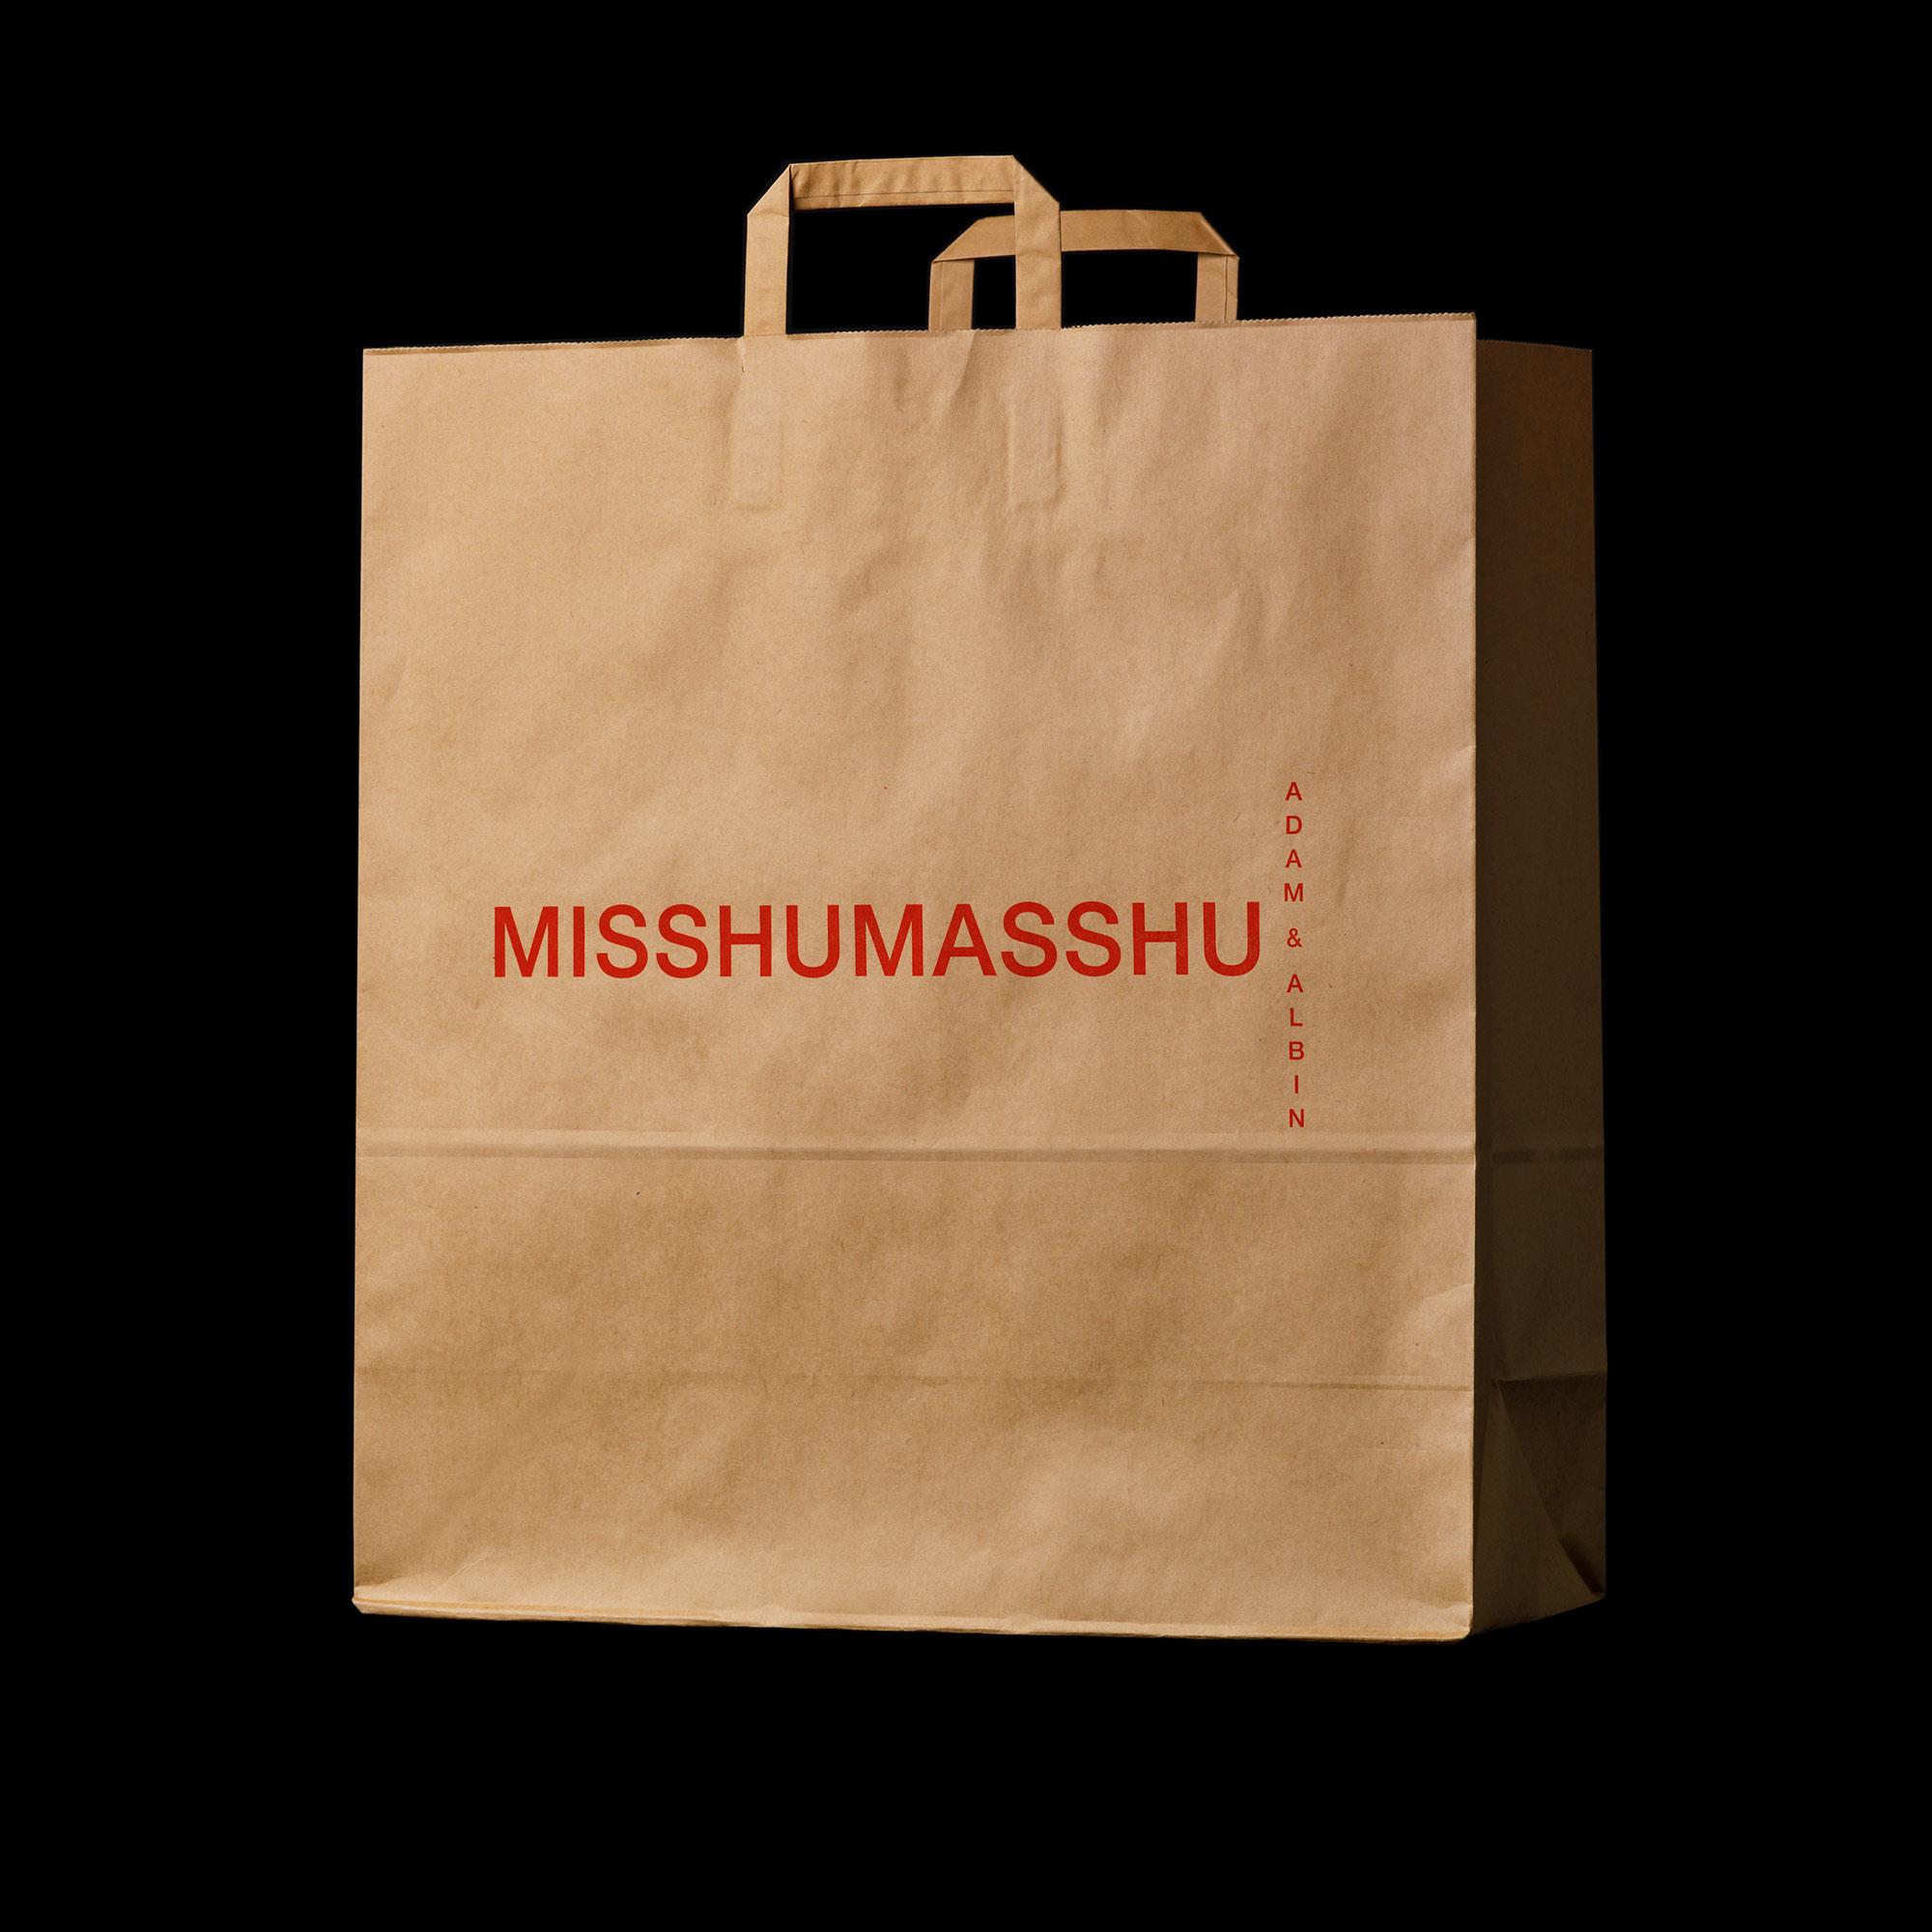 MisshuMasshu-Insta-2.jpg